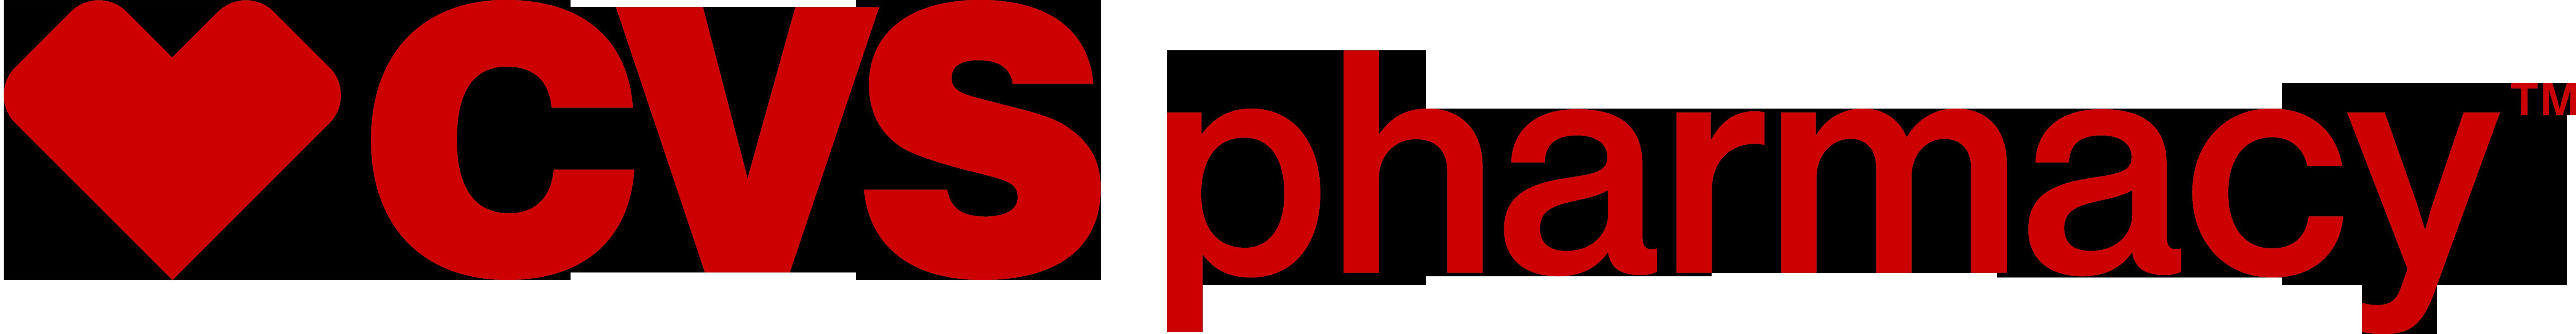 File:CVSPharmacyLogo2014.png - Wikimedia Commons